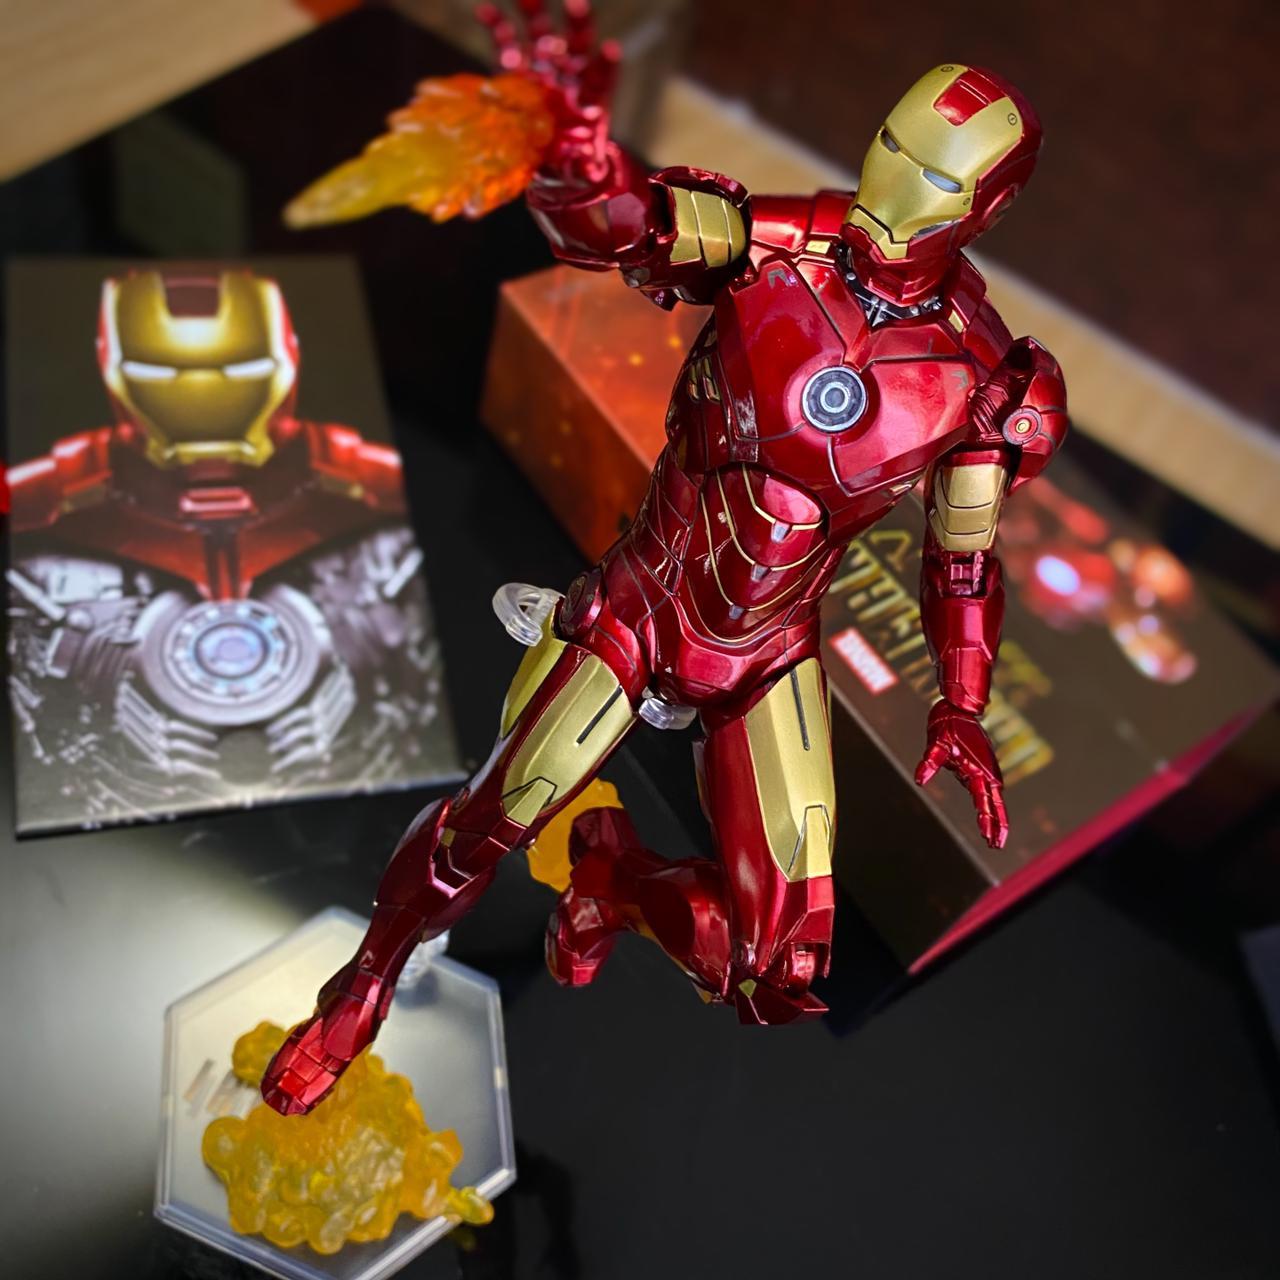 Action Figure Homem de Ferro: Homem de Ferro 2 Iron Man 2 Mark IV Mark 4 Marvel - EV